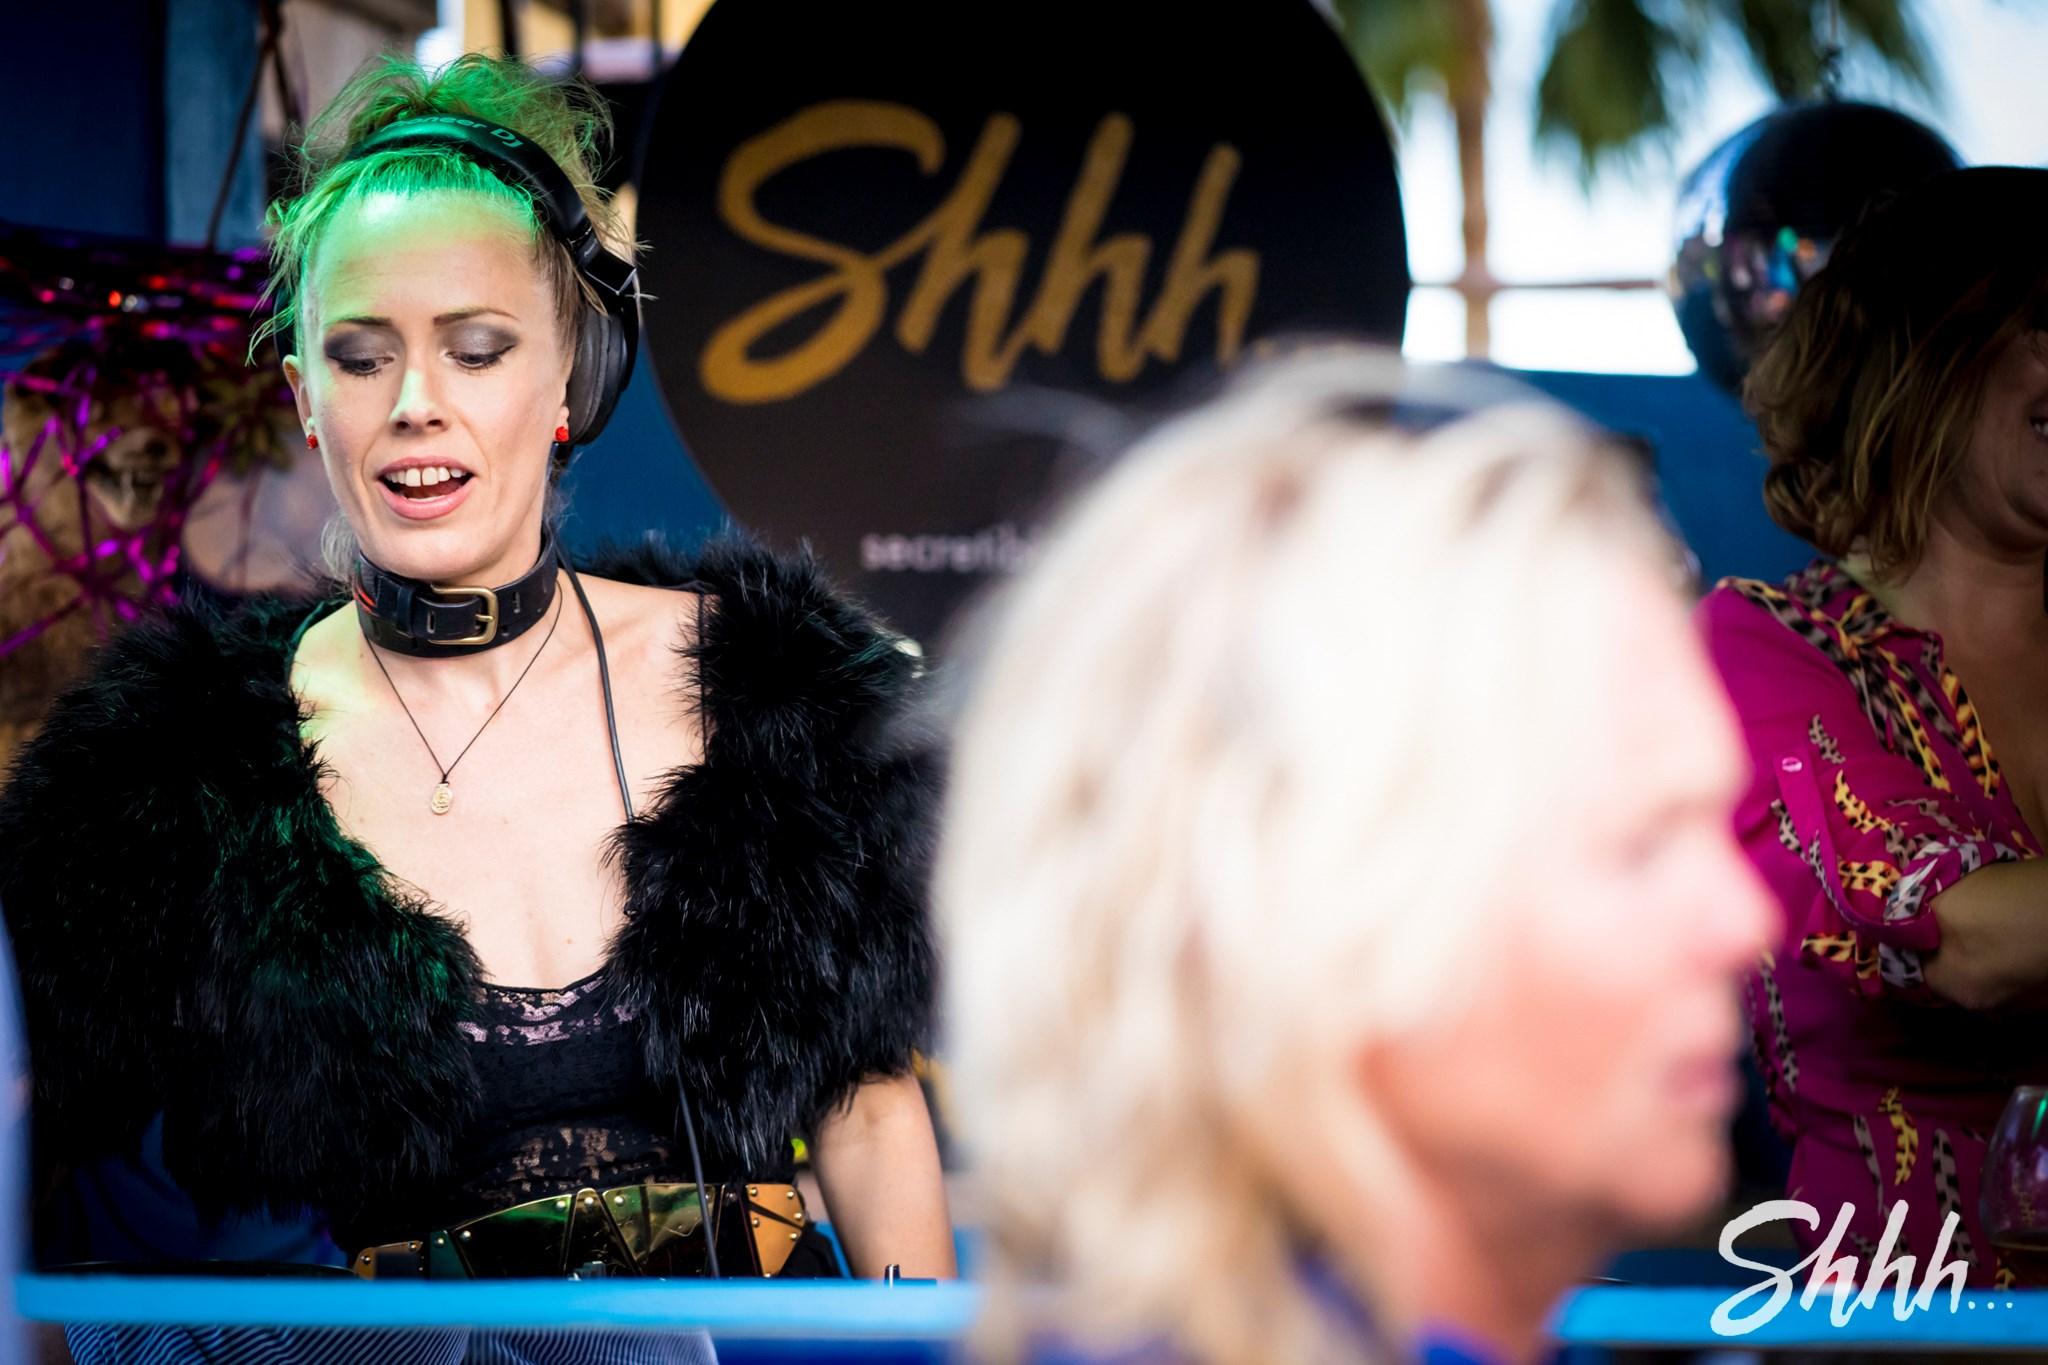 Queen of the decks, Sarah Main